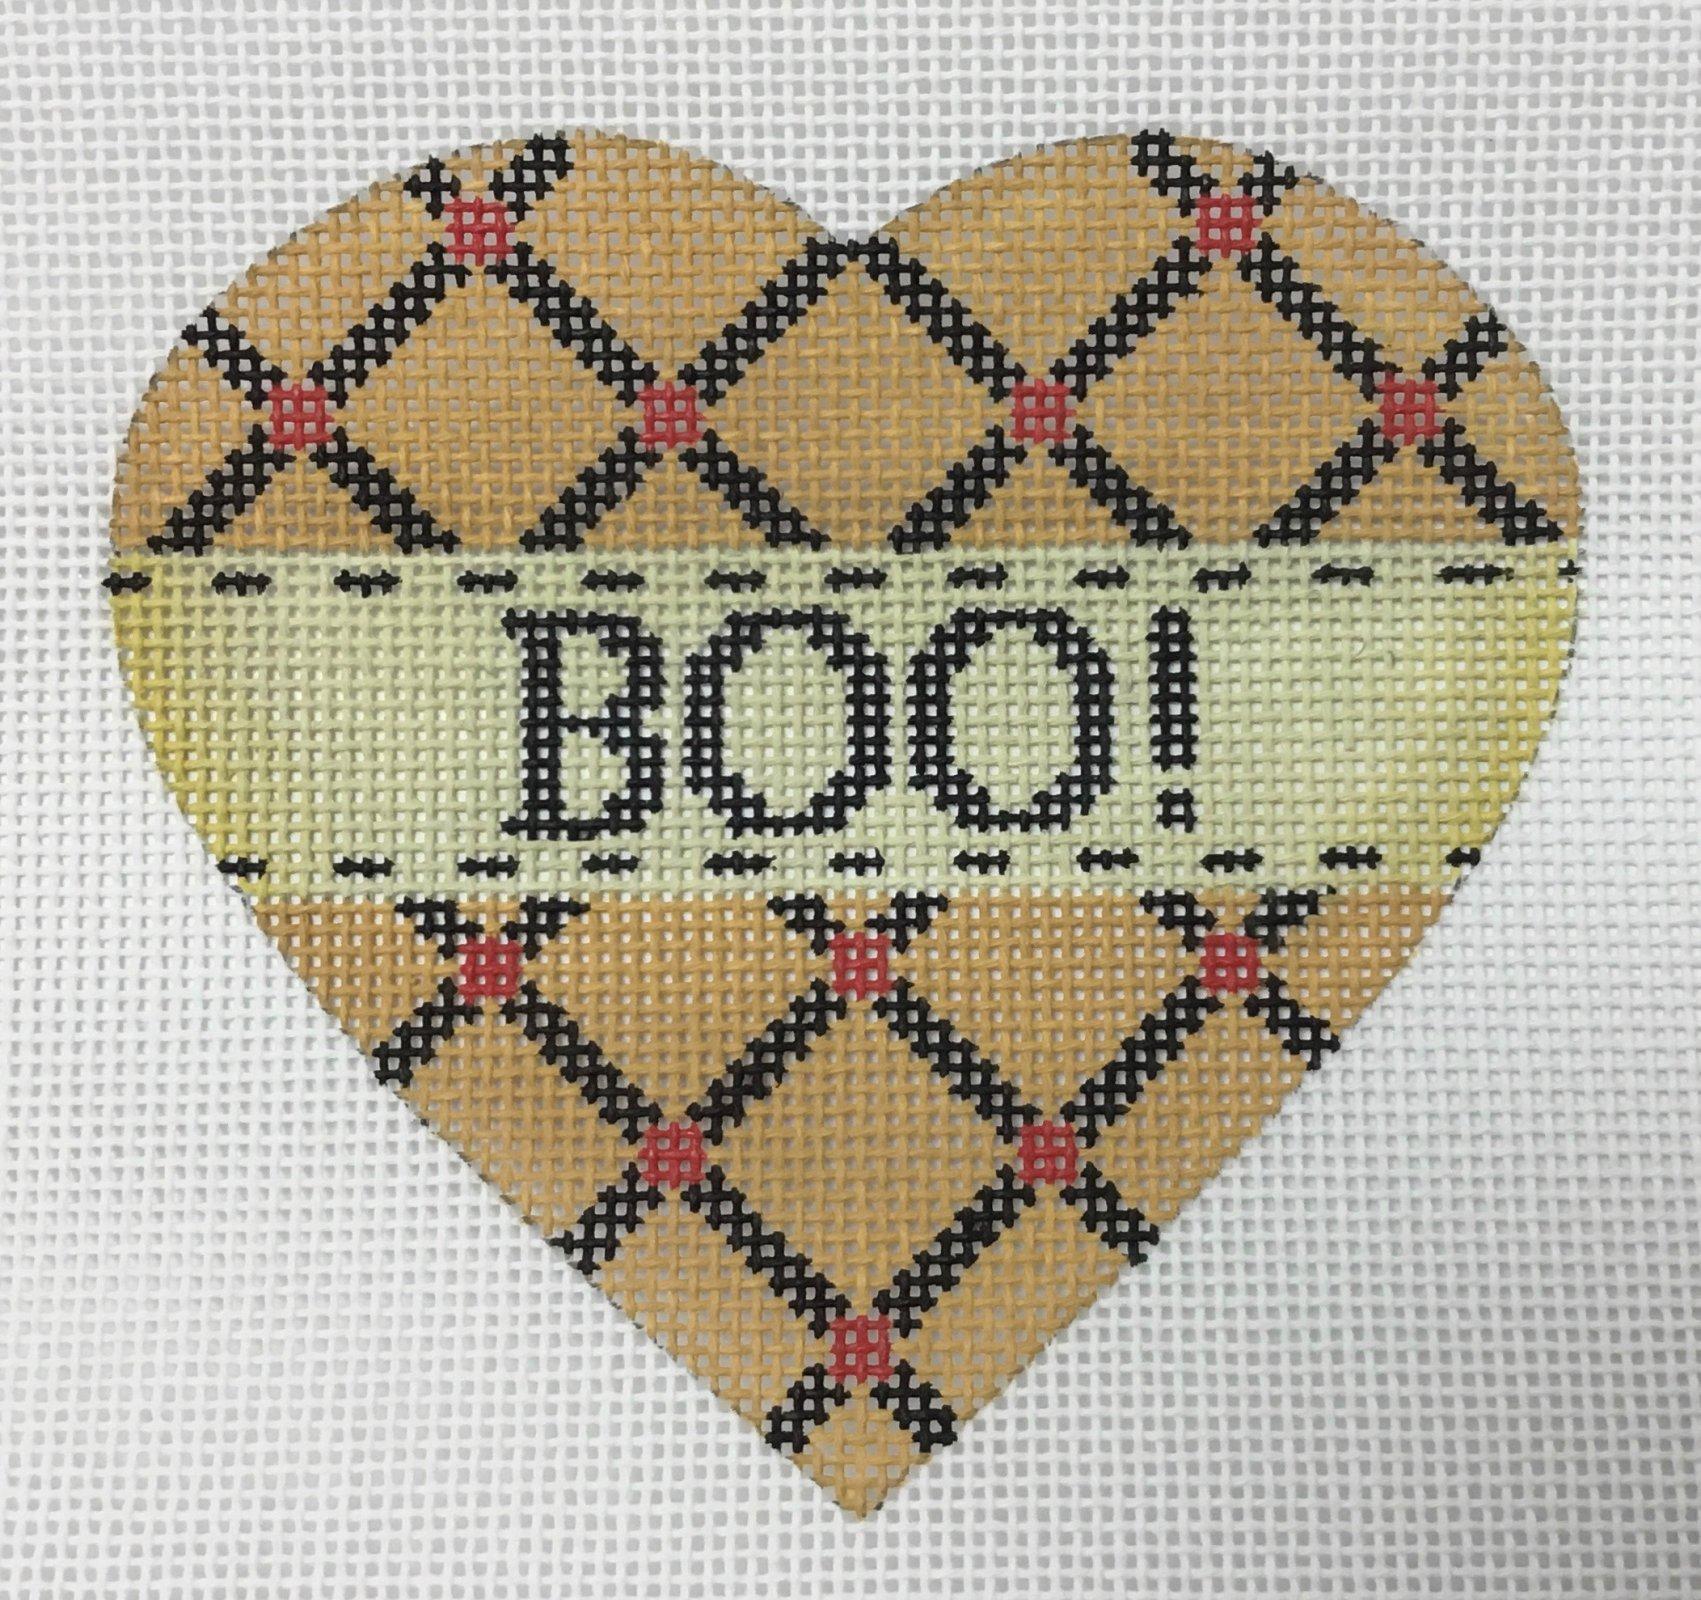 Boo Heart, 18 ct., 4 x 4